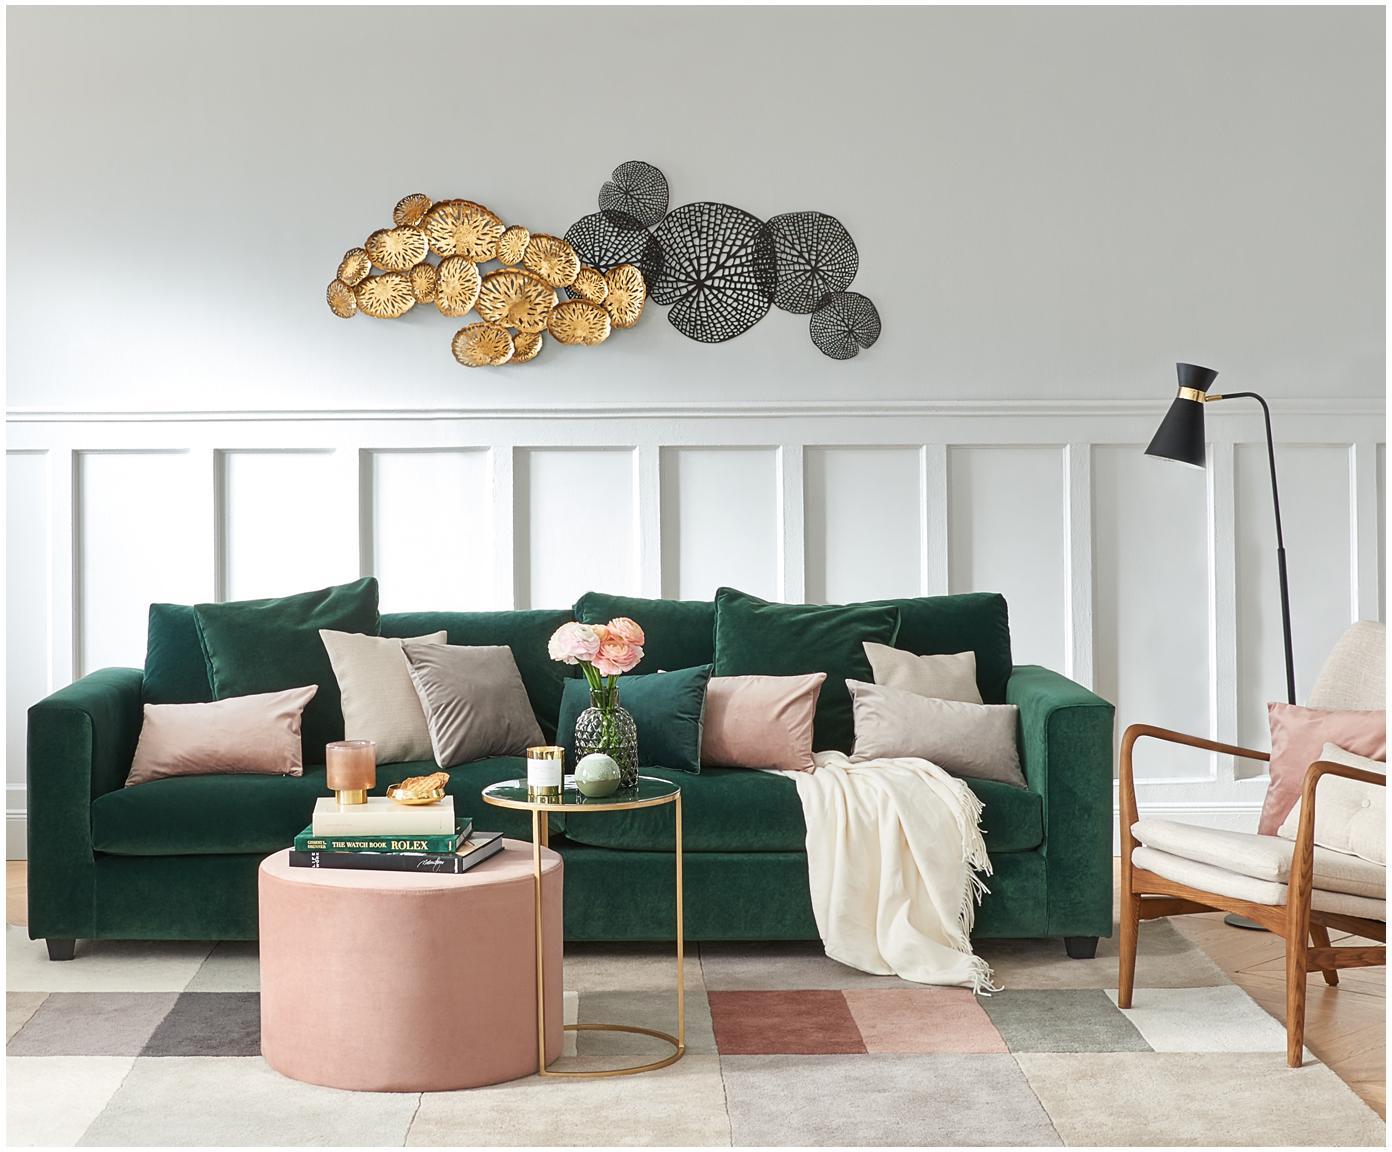 Samt-Sofa Linda (3-Sitzer), Bezug: Polyester (Samt) 47.000 S, Rahmen: Spanholz, Massivholz, Beine: Kunststoff, lackiert, Bezug: Grün<br>Beine: Schwarz, 261 x 83 cm